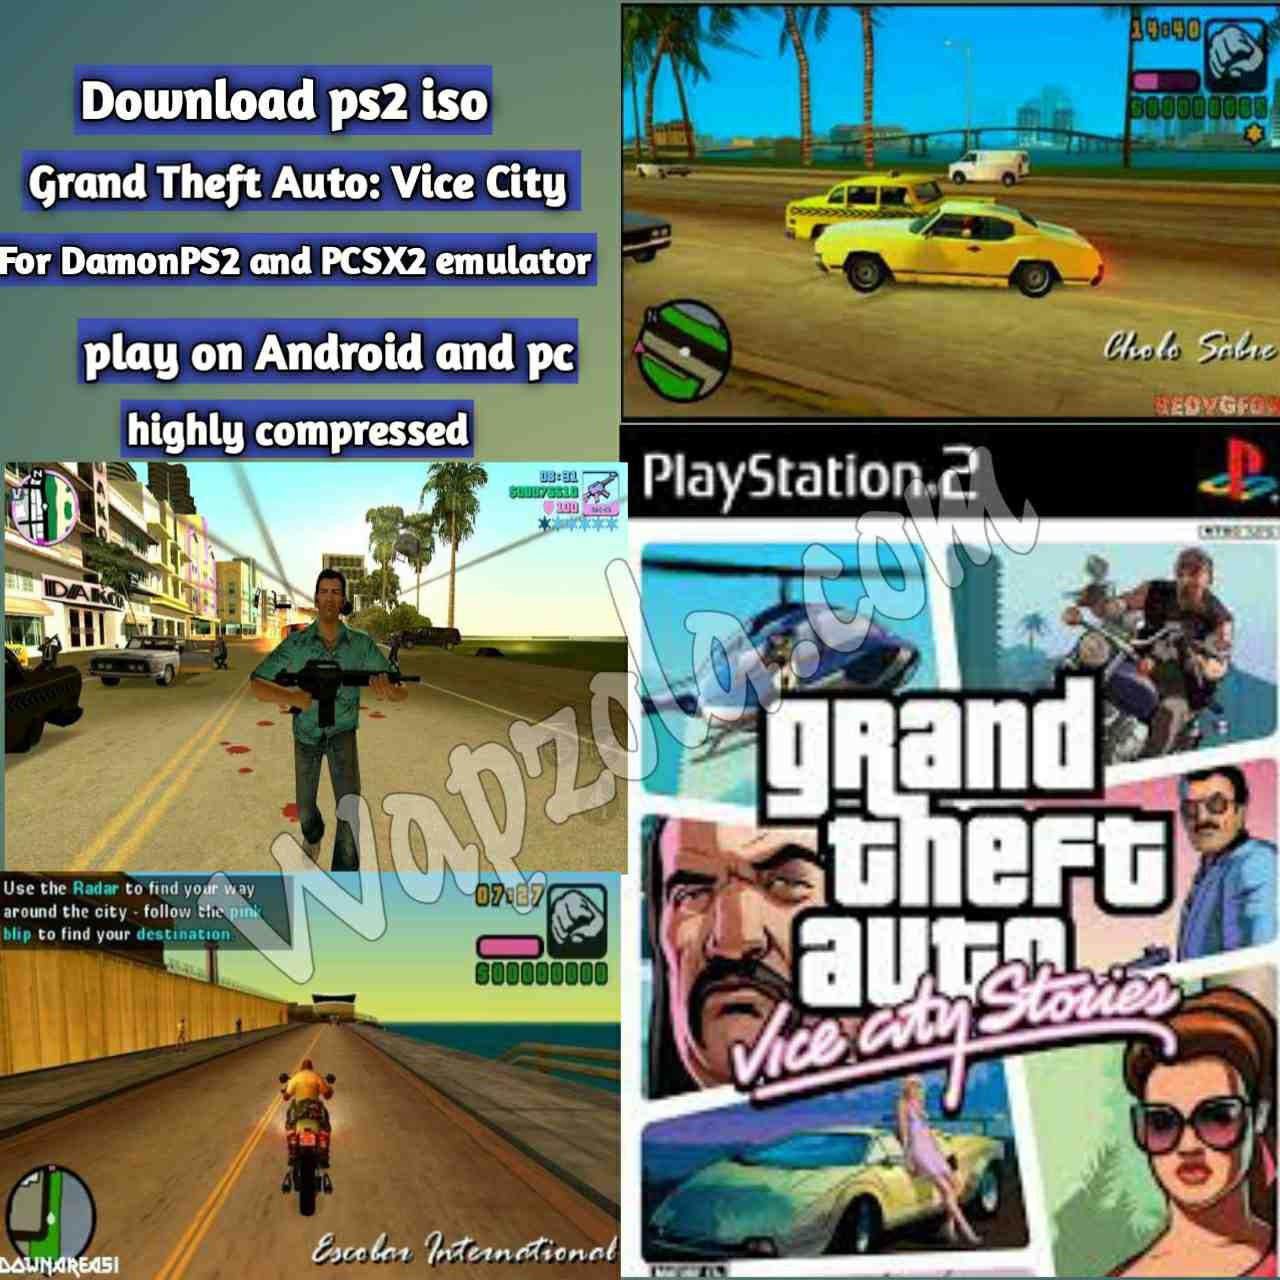 gta-vice-city-ps2-iso-damonps2-pcsx2-emulator-playstation-2